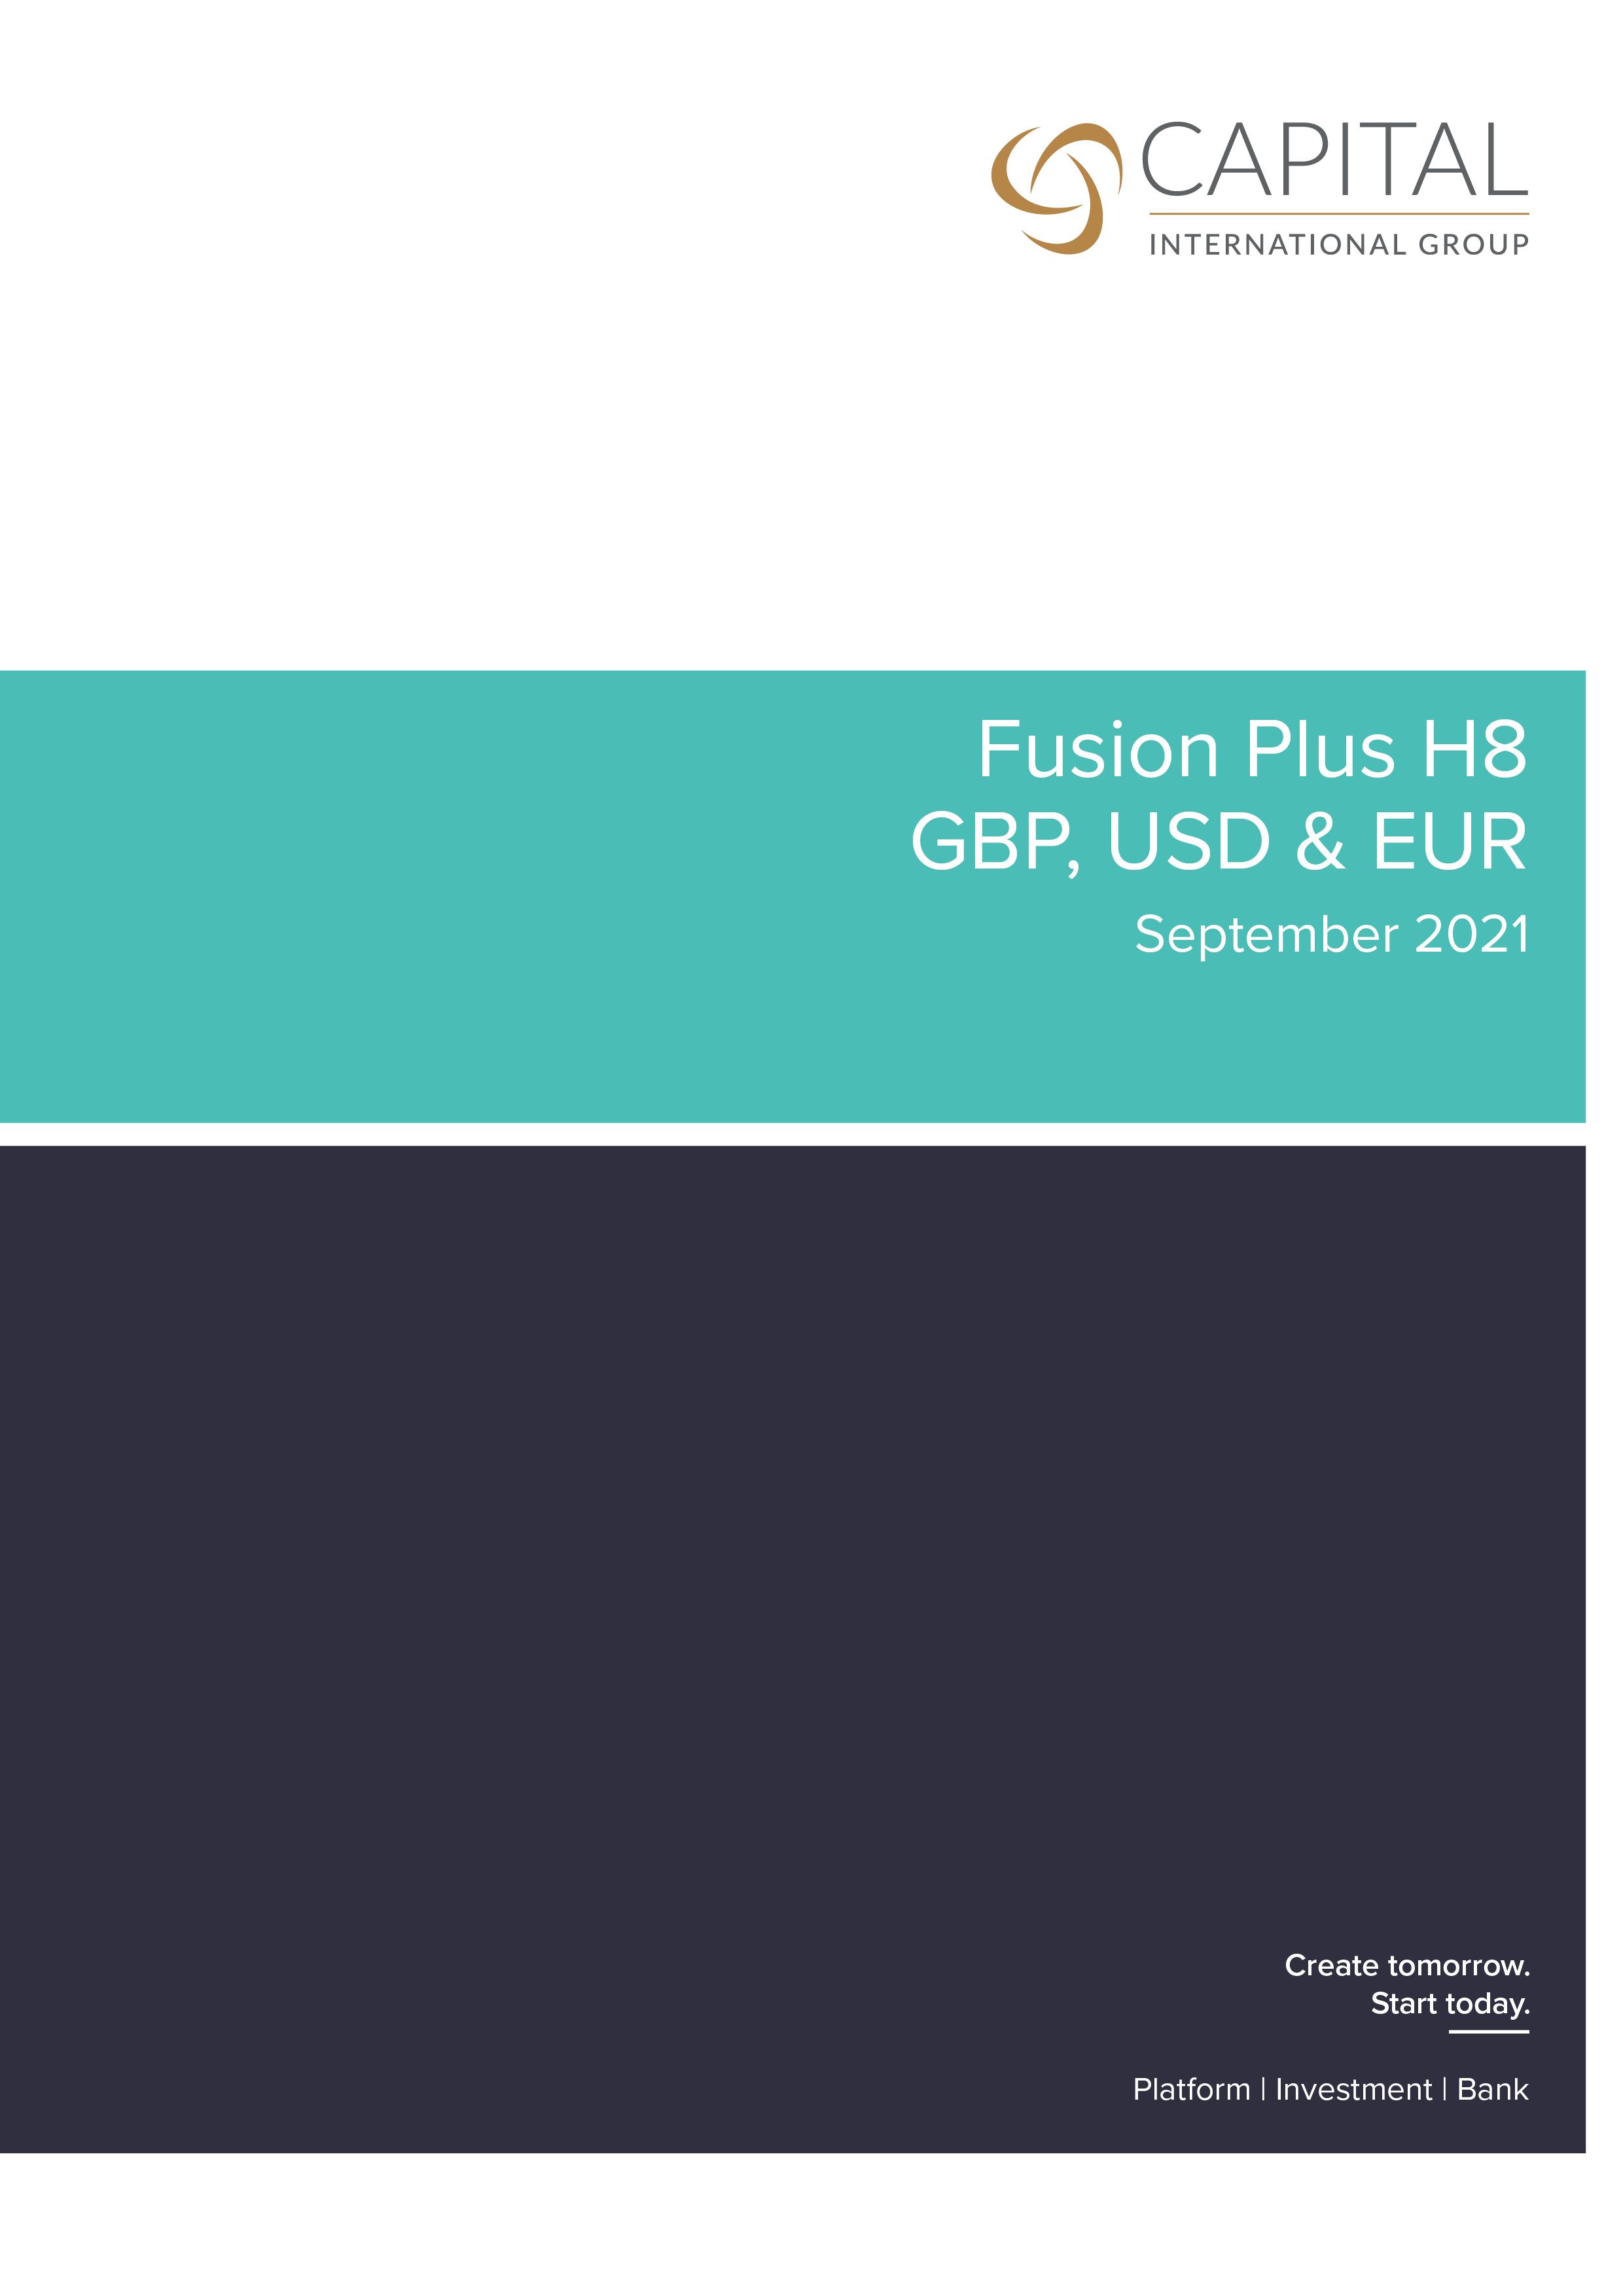 Fusion Plus H8 September 2021